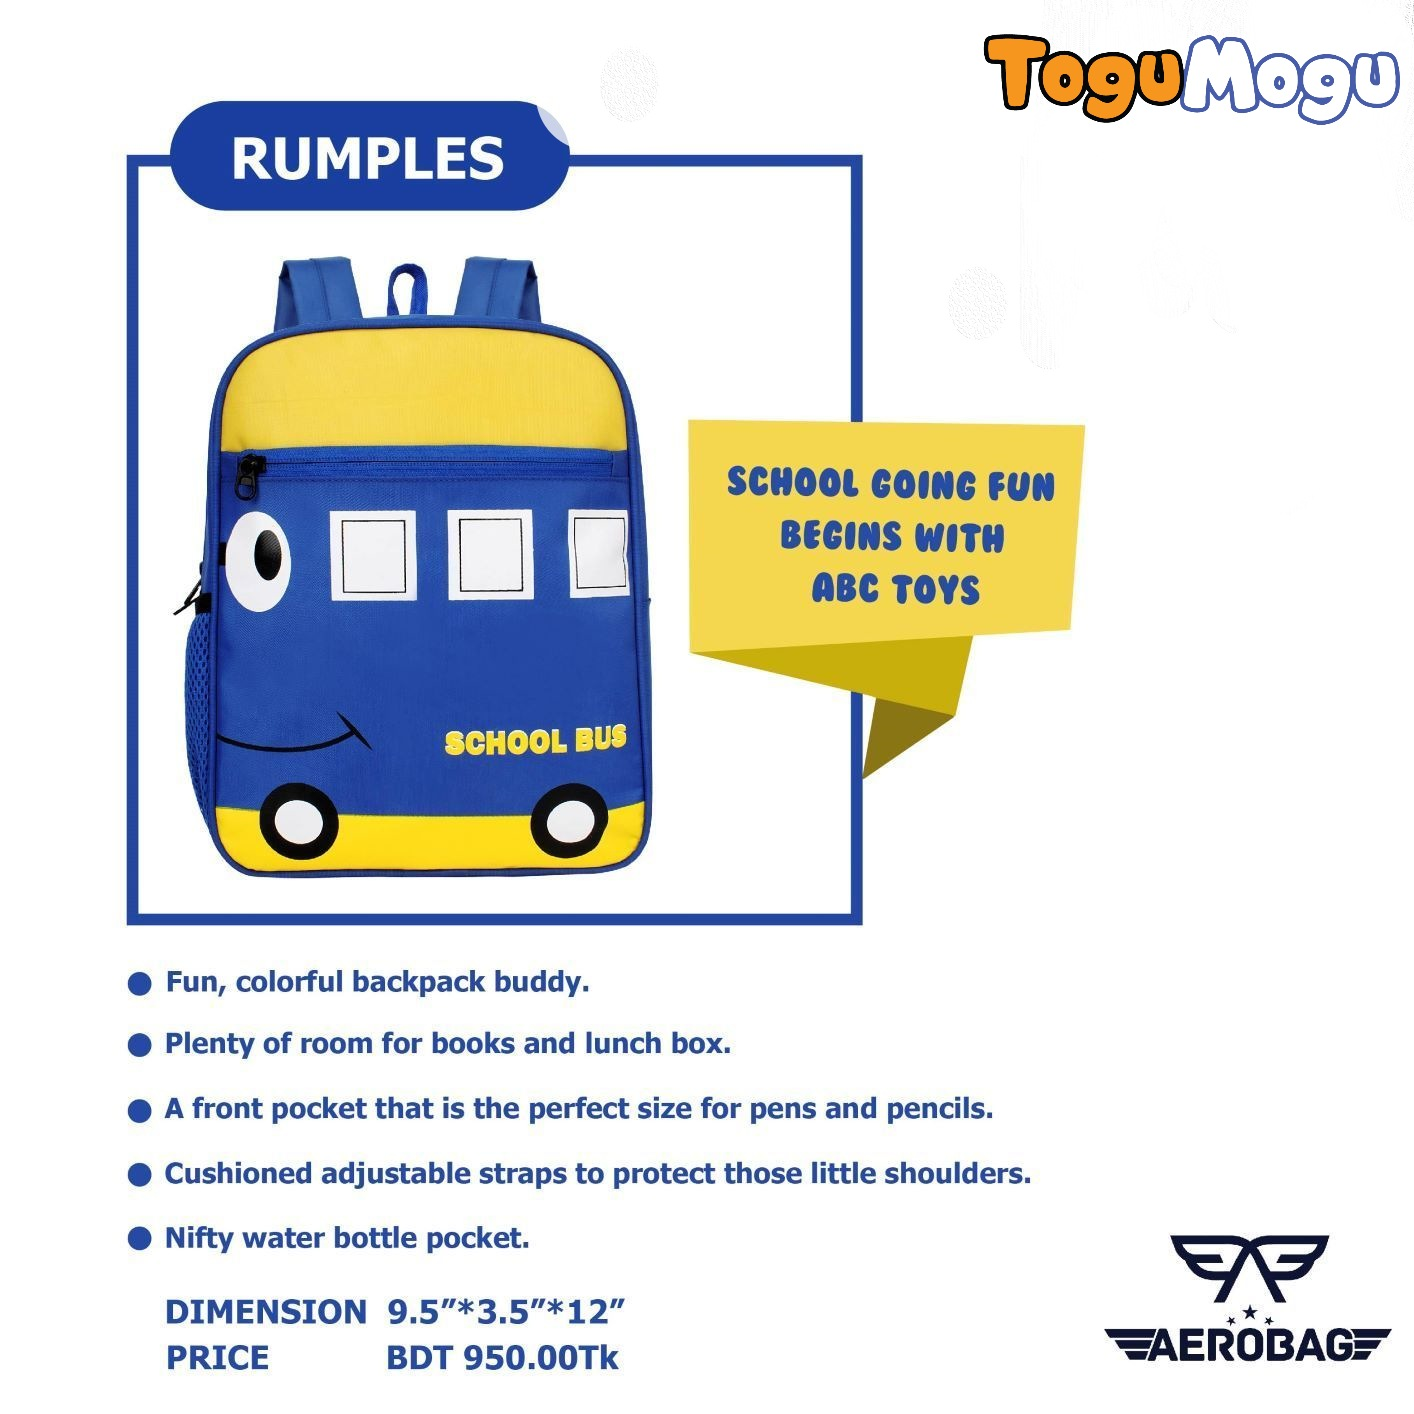 AEROBAG AER001 Rumples Bus